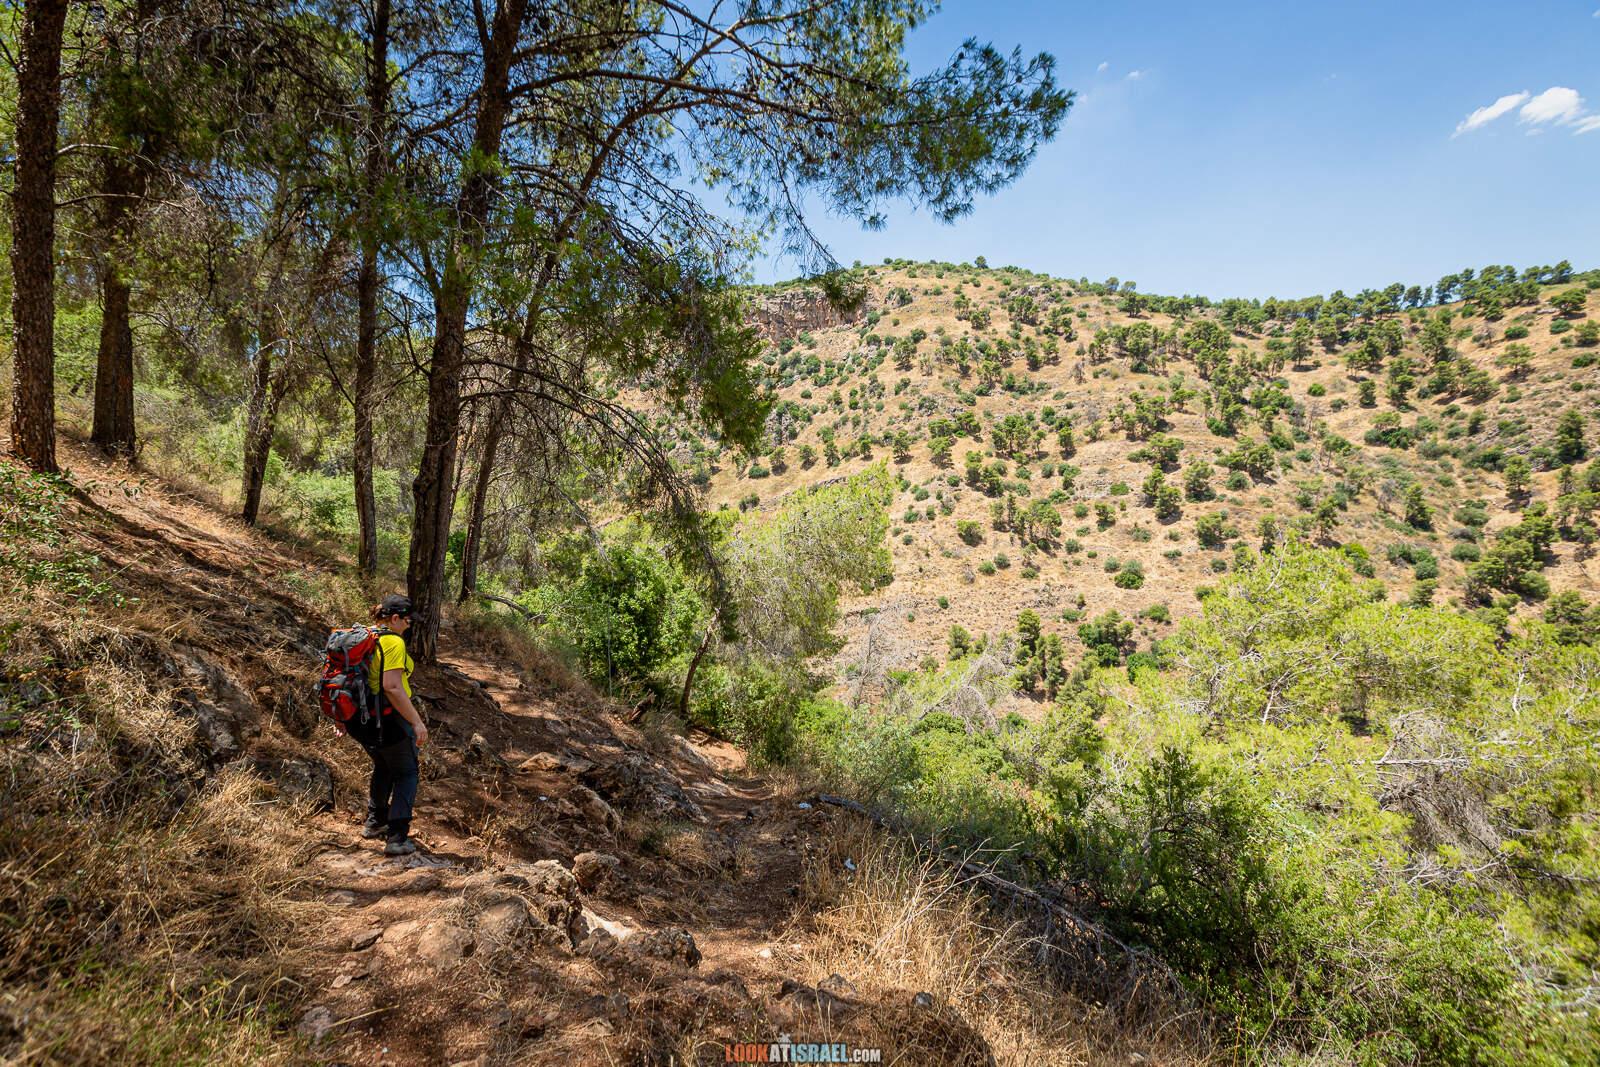 Тропа ПАЛЬМАХа | שביל הפלמח | LookAtIsrael.com - Фото путешествия по Израилю